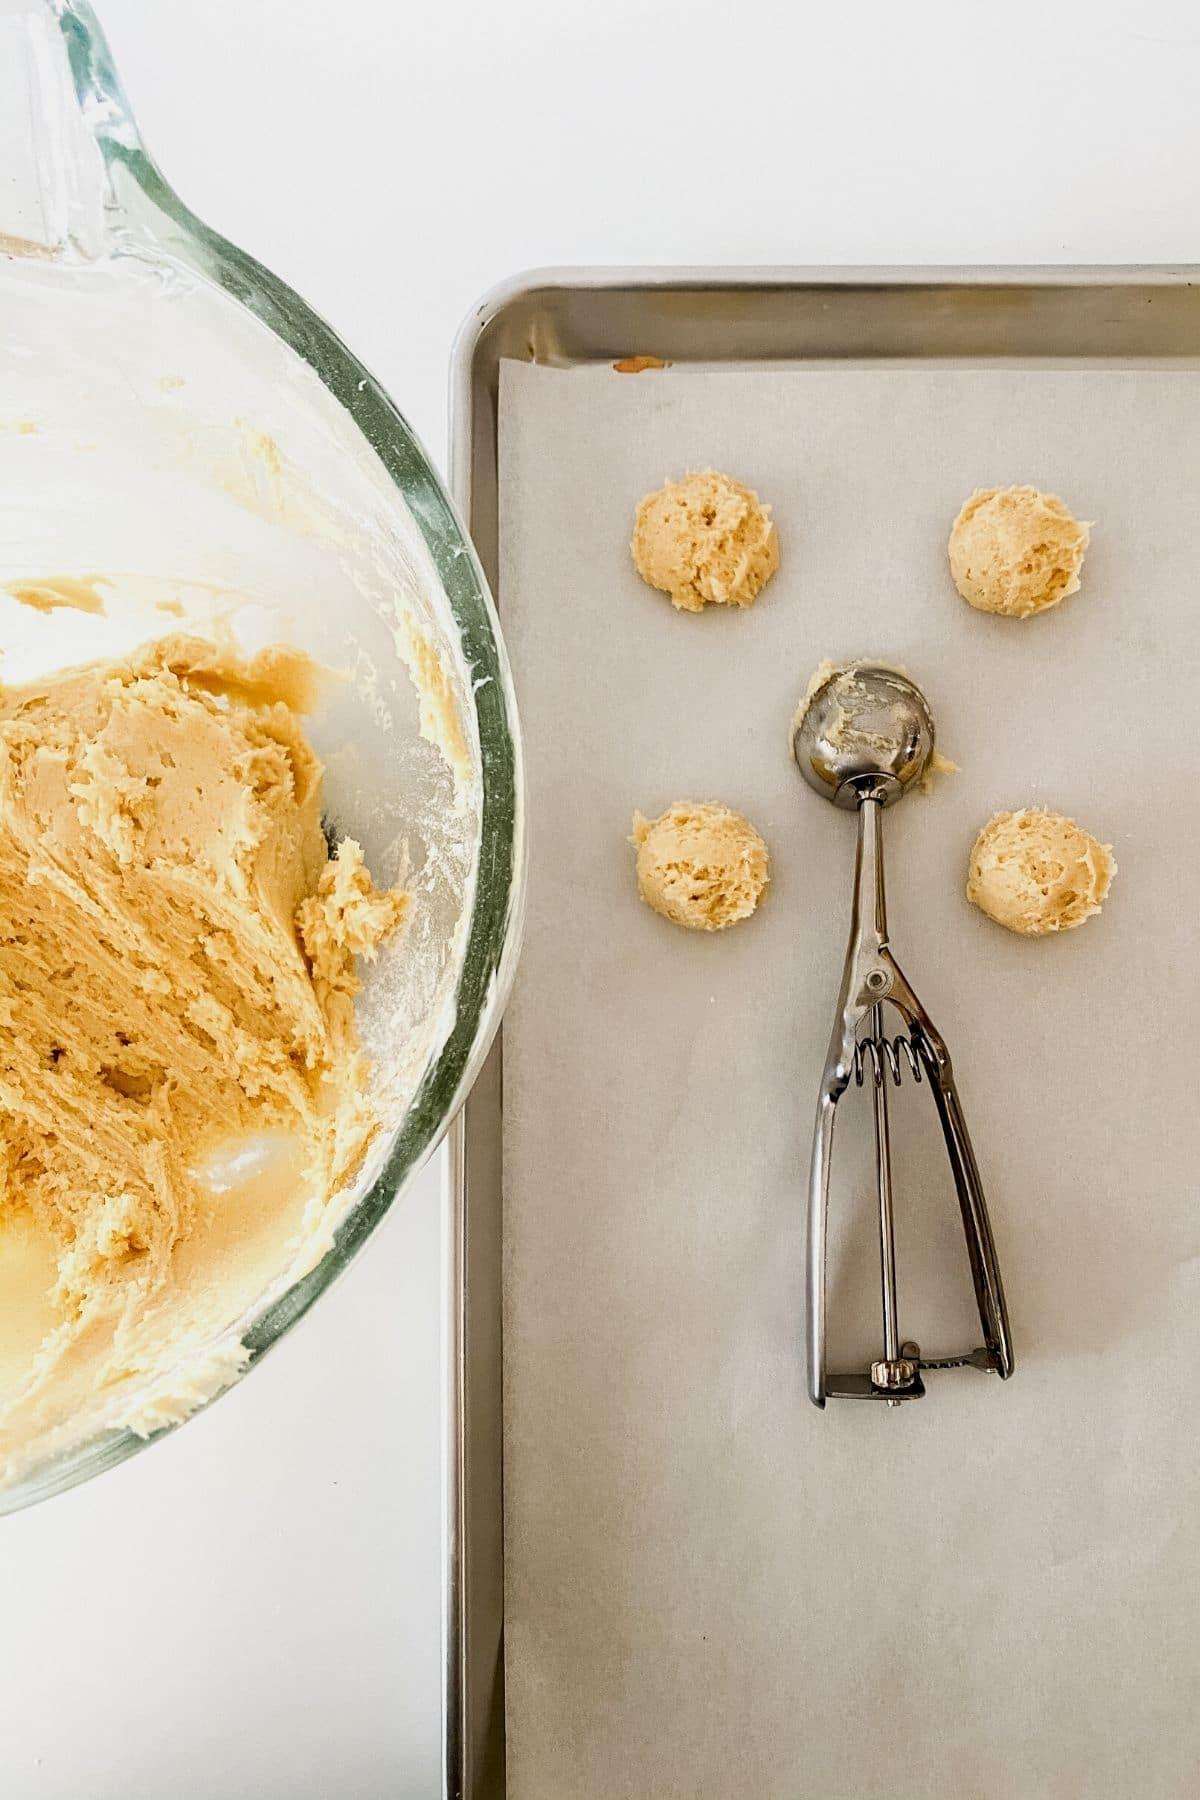 Scooping cookies onto baking sheet